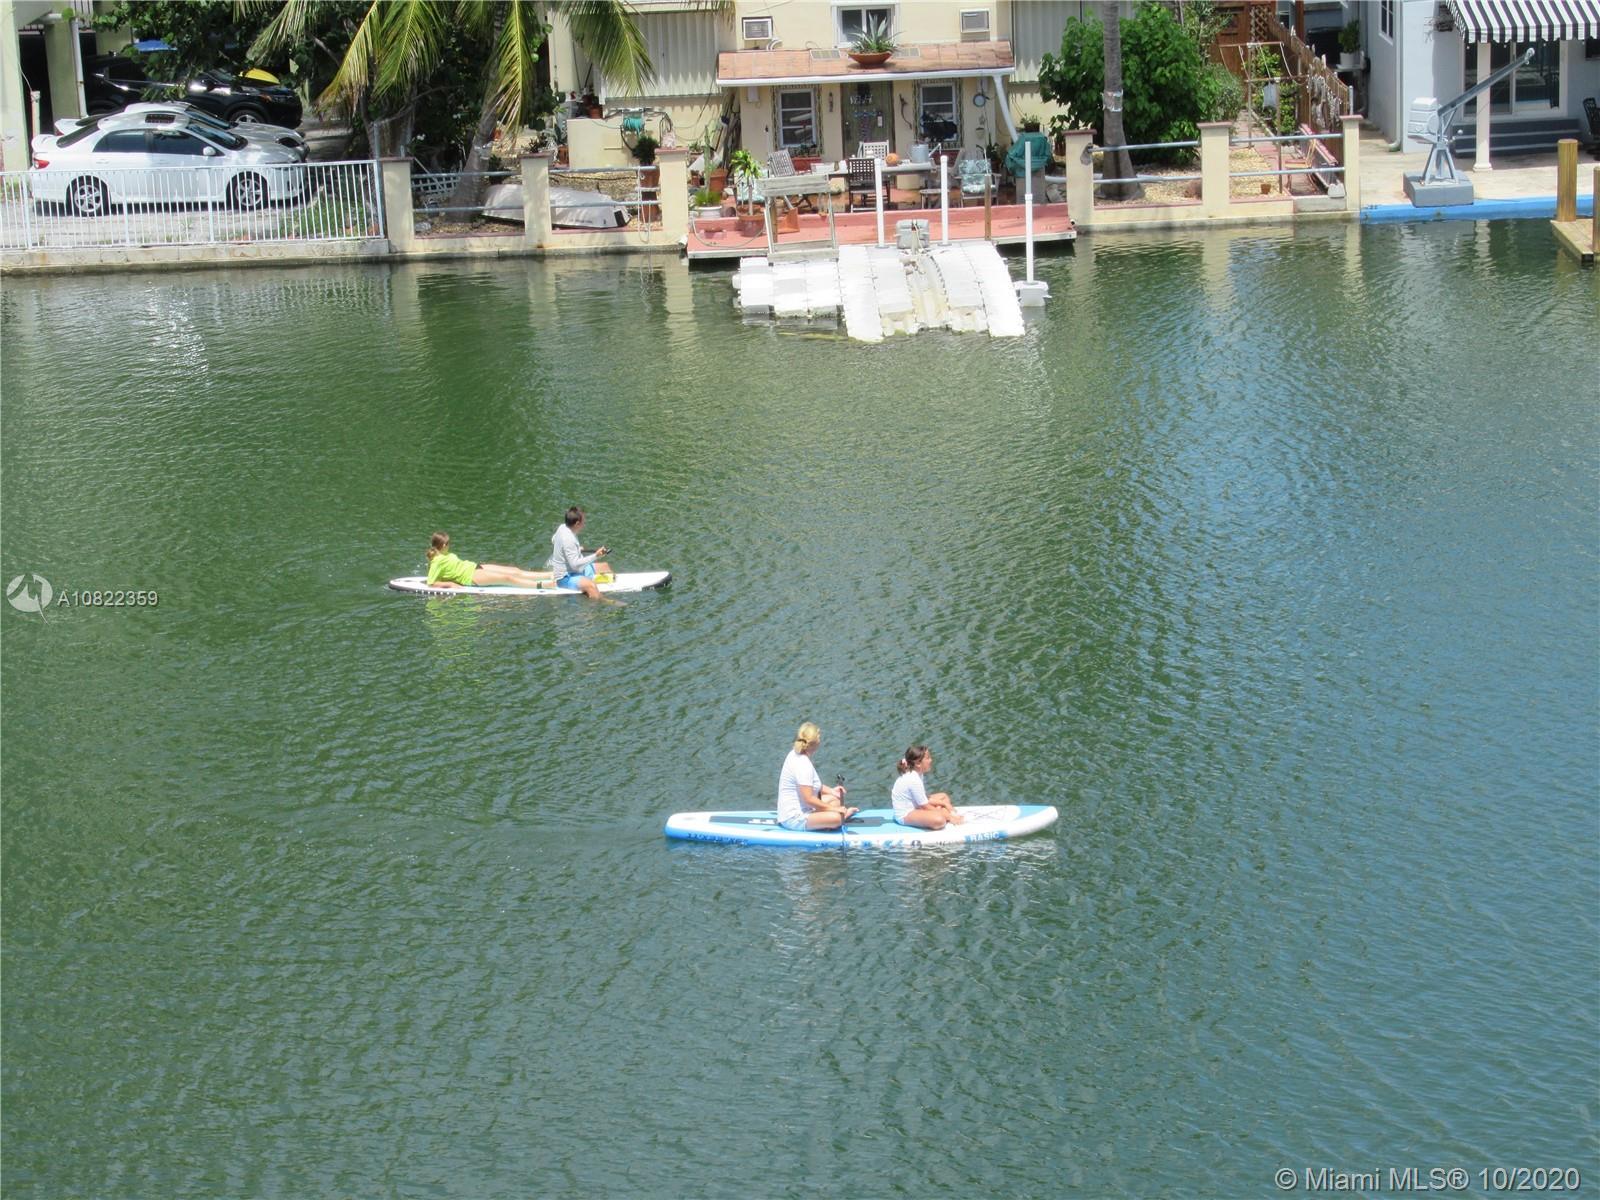 8040  Tatum Waterway Dr #3 For Sale A10822359, FL